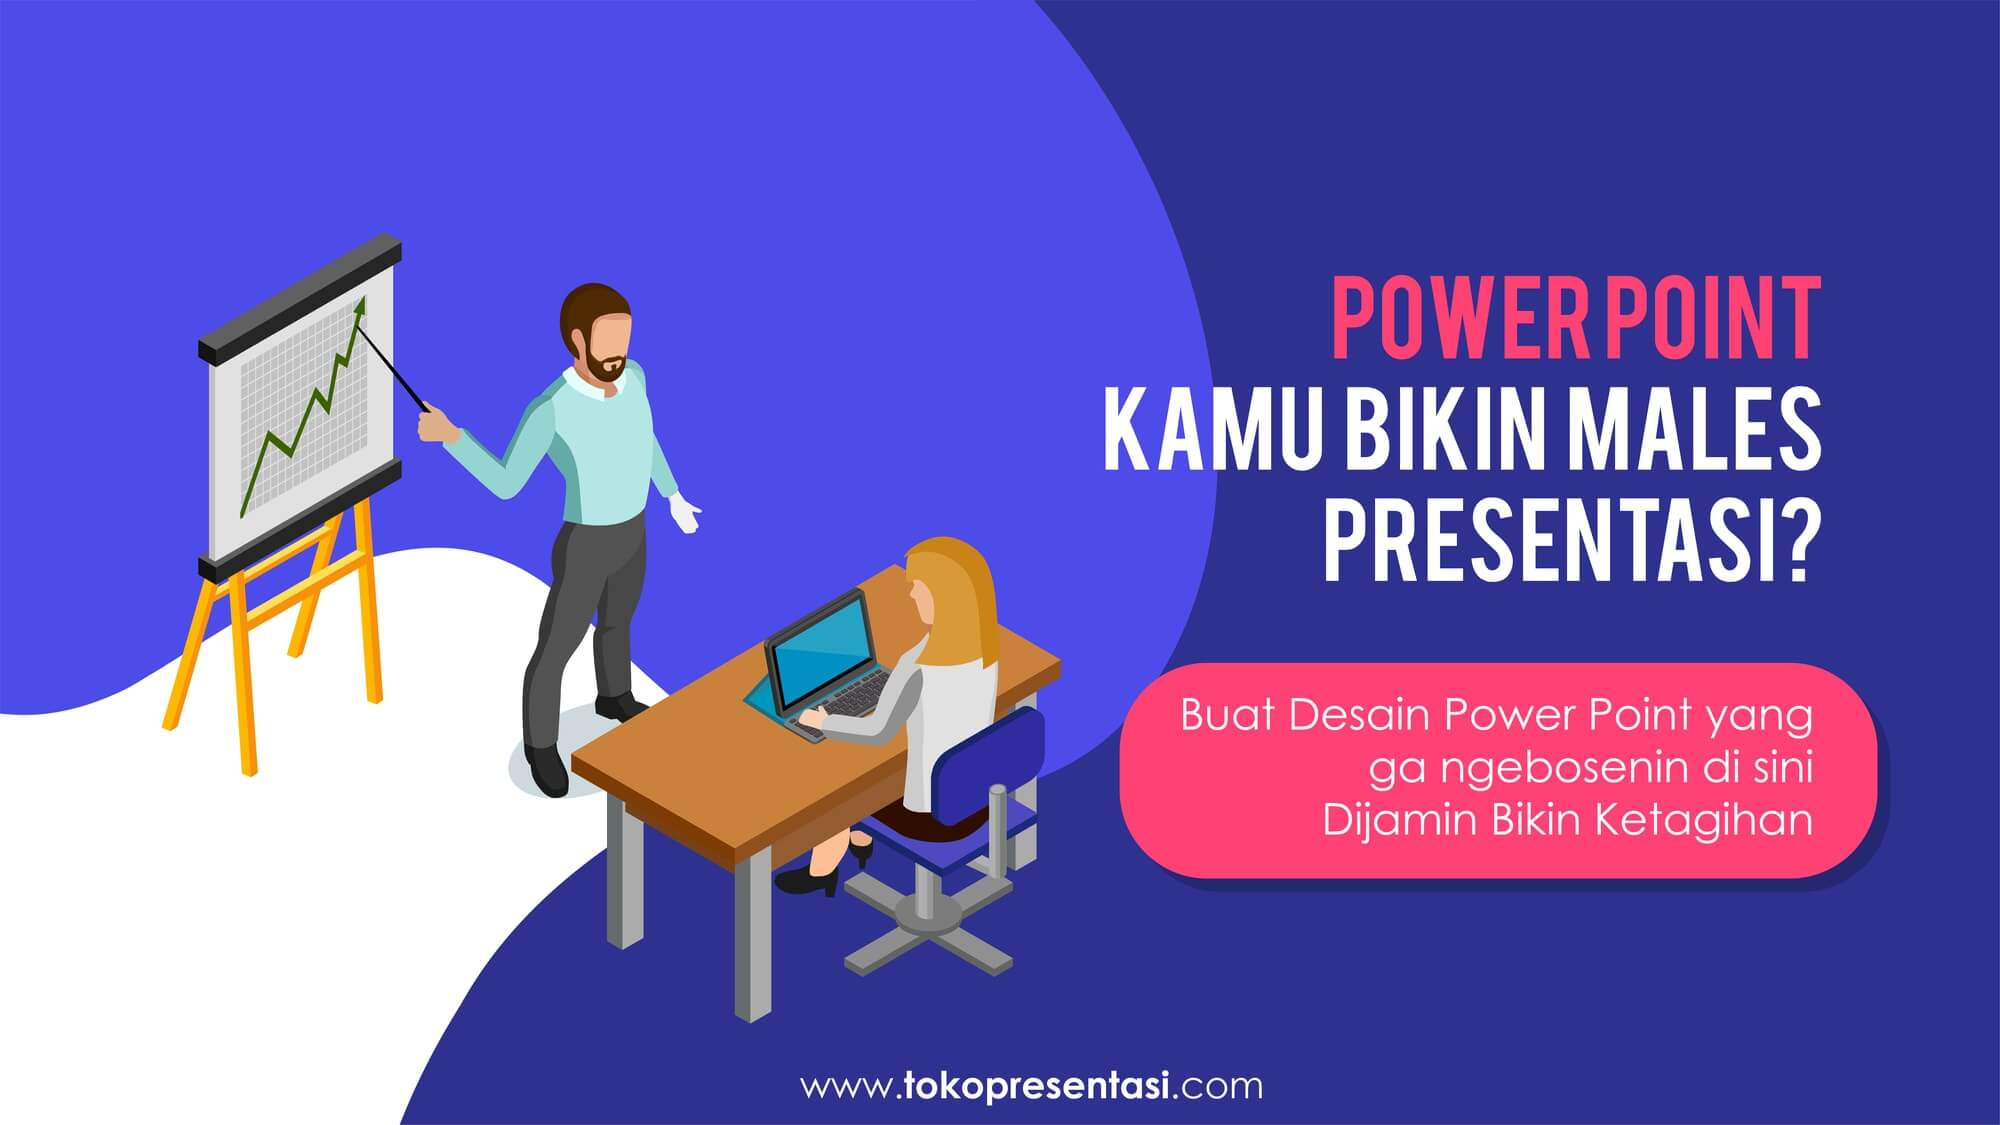 Jasa Pembuatan Desain Presentasi Powerpoint Lomba Inovasi GKM WKM TKMPN Petrokimia Gresik Tokopresentasi